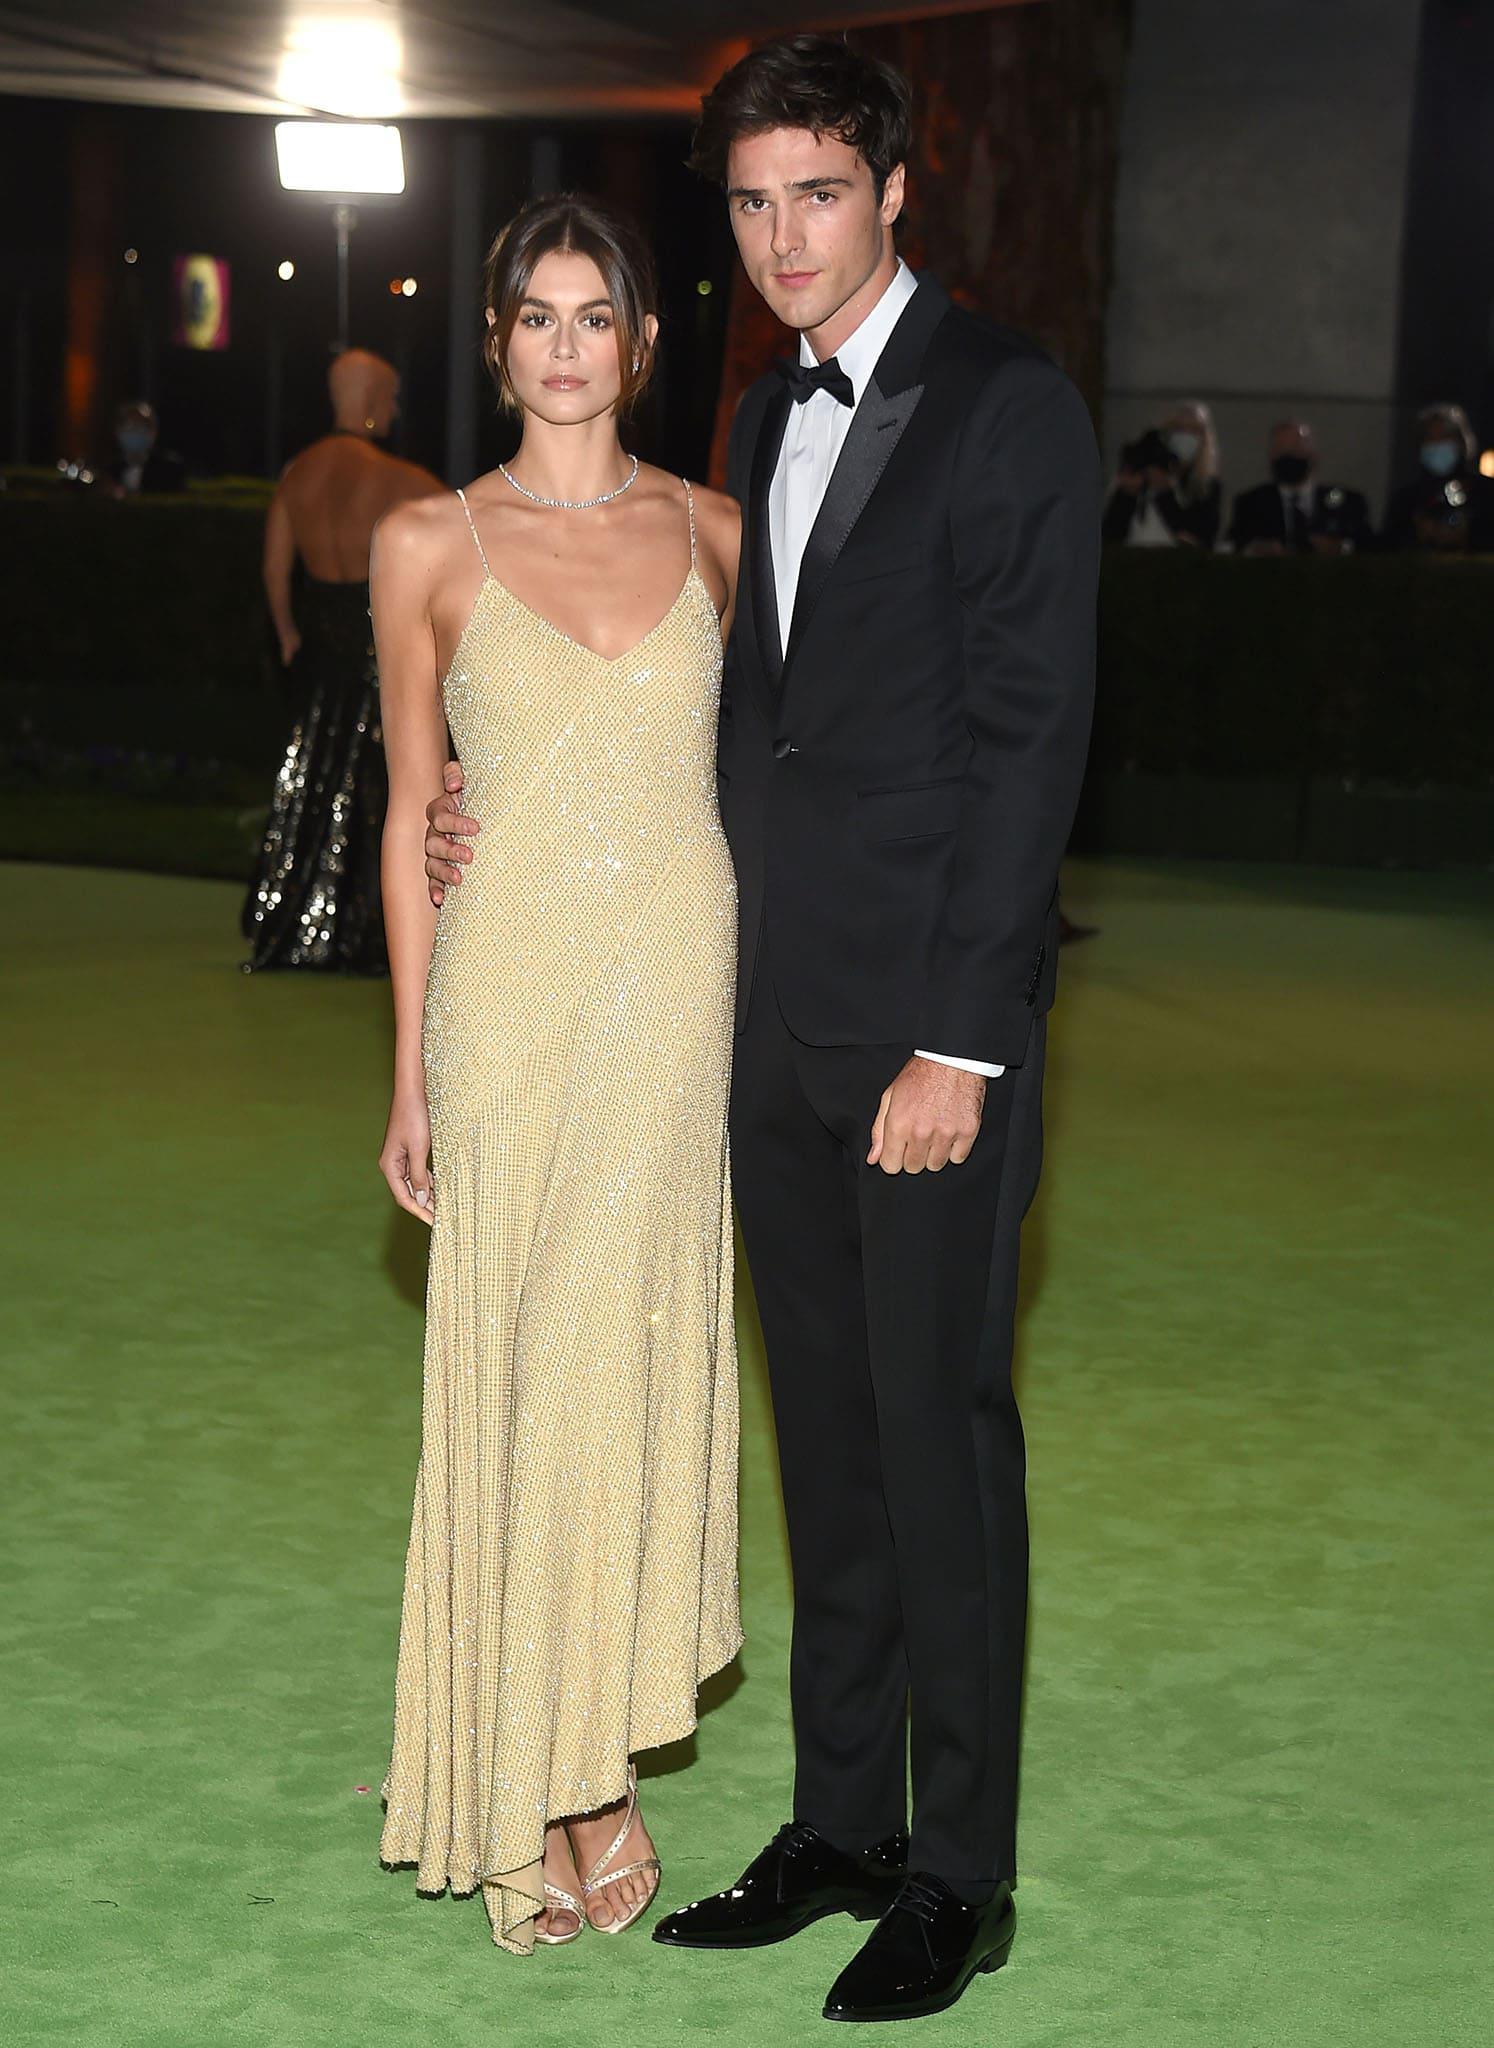 Kaia Gerber and her super tall boyfriend Jacob Elordi make their red carpet debut in Celine ensembles